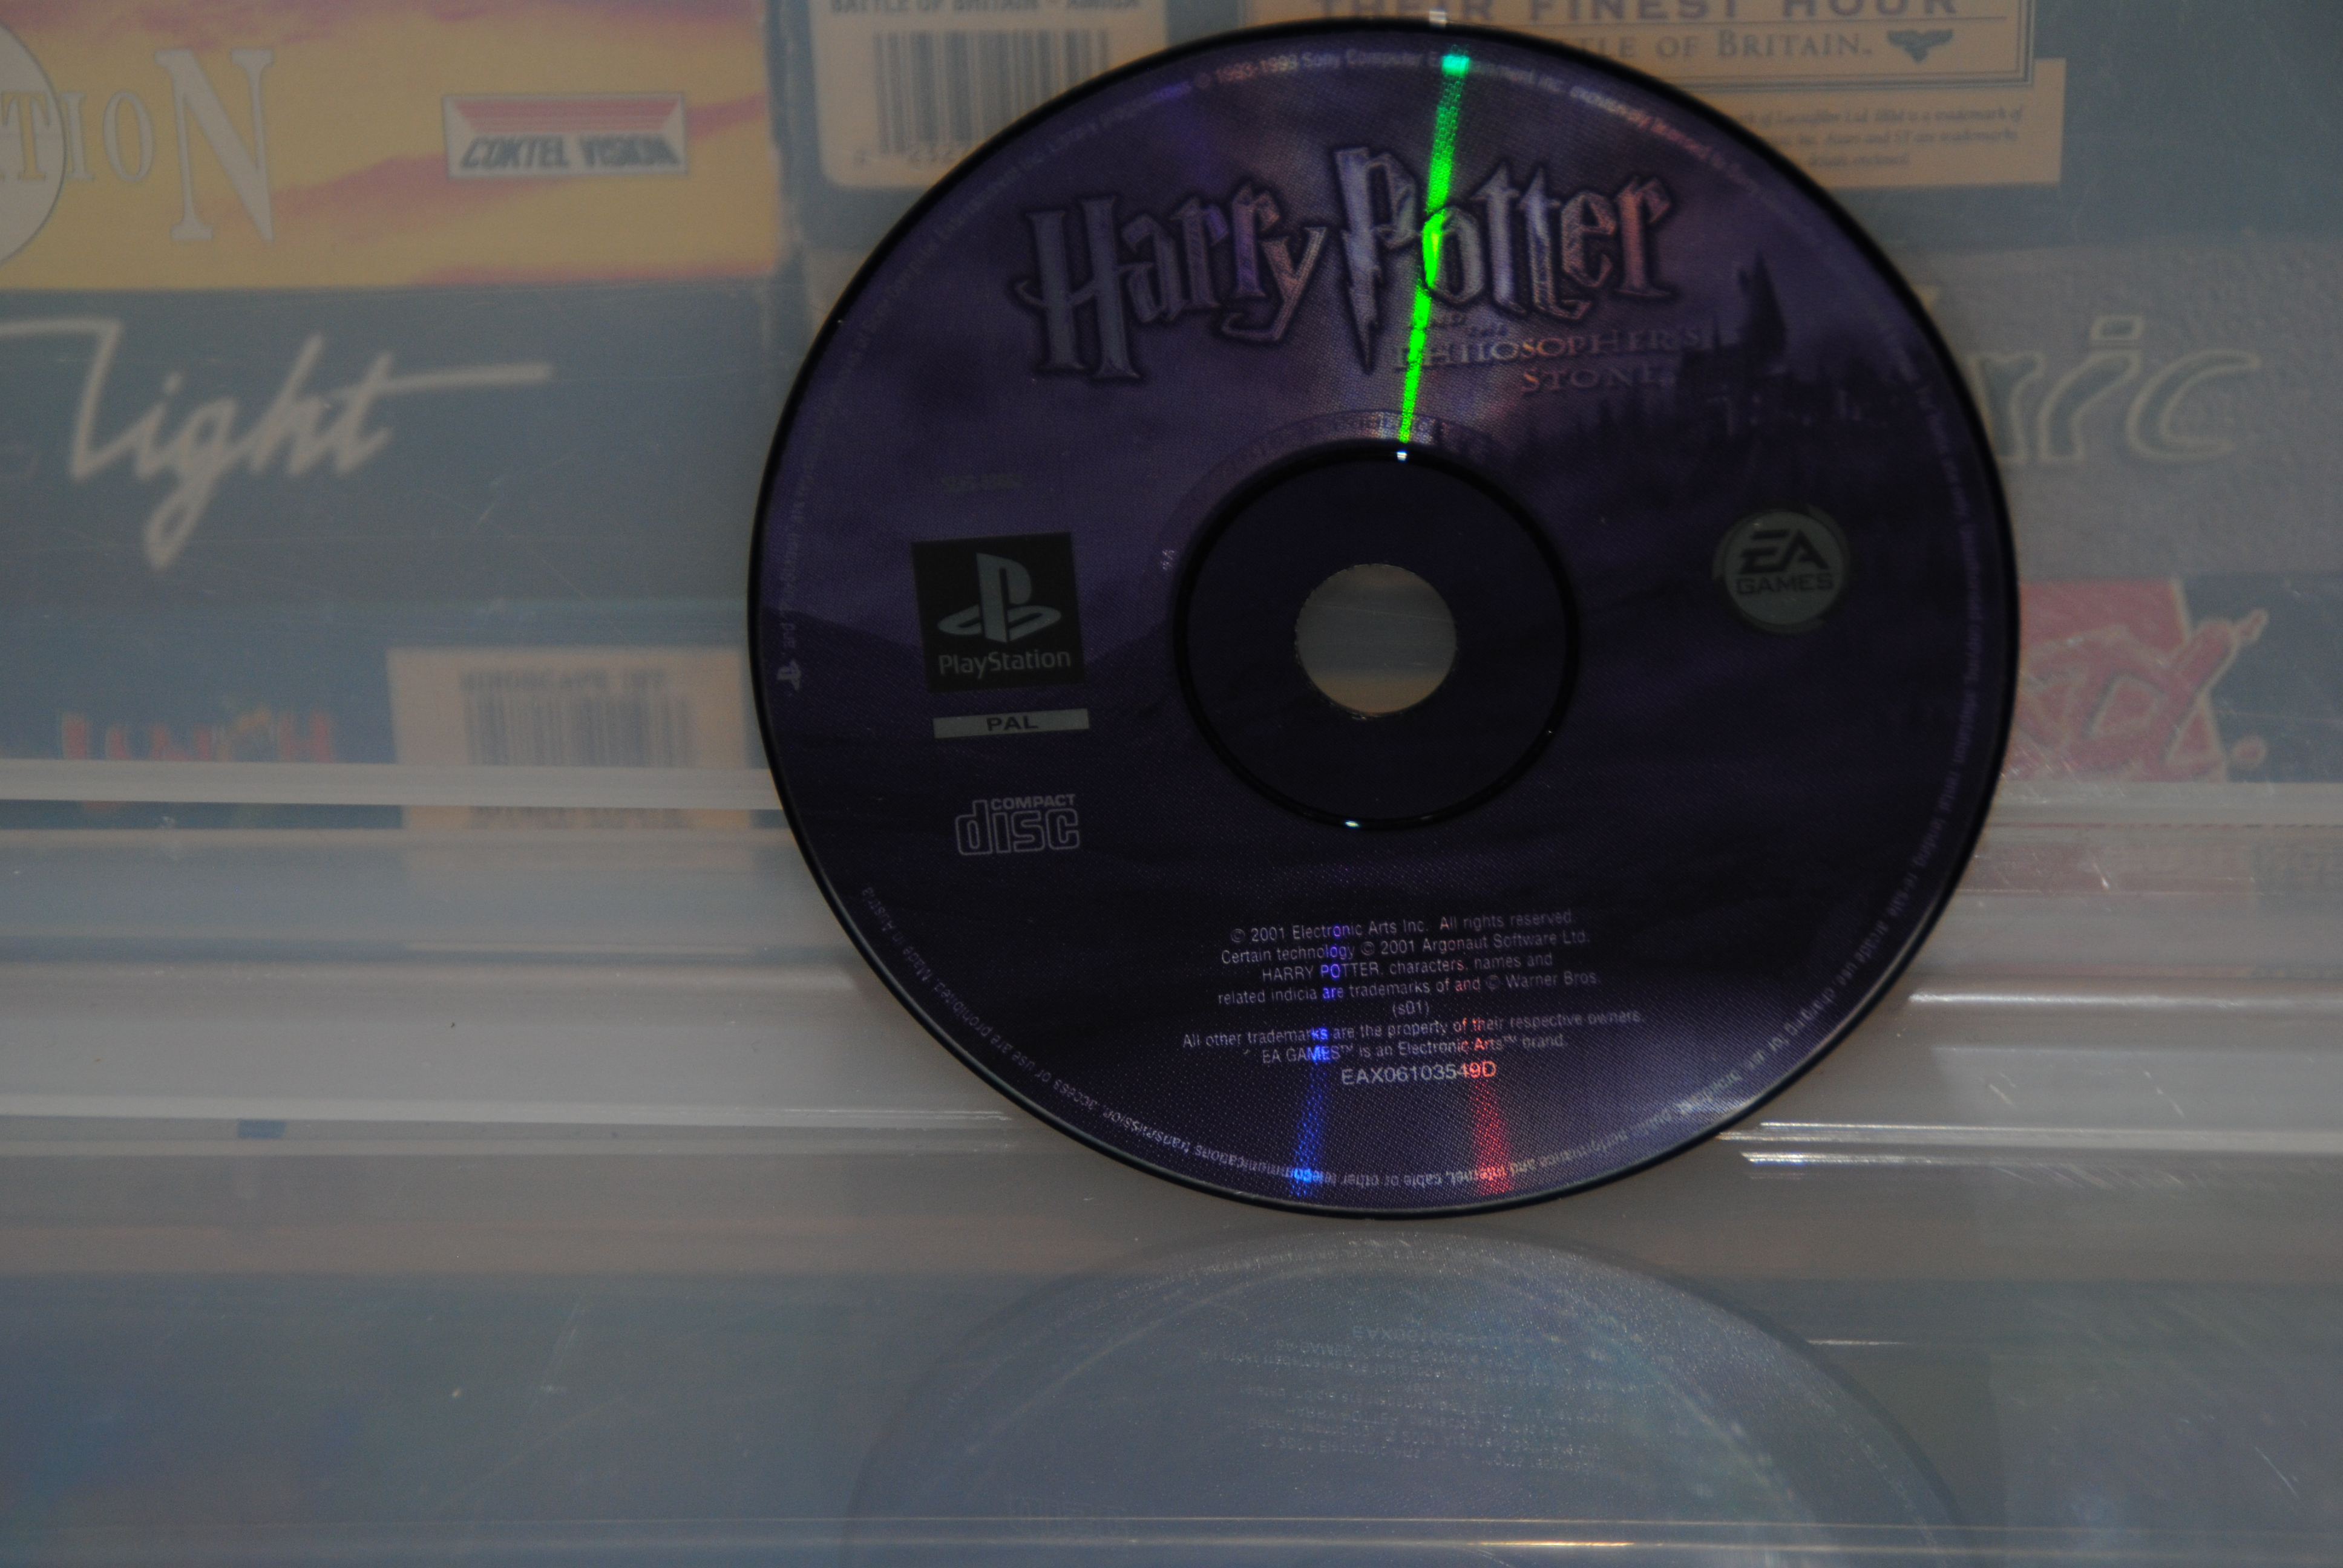 E.A - Harry Potter Philospers Stone CD